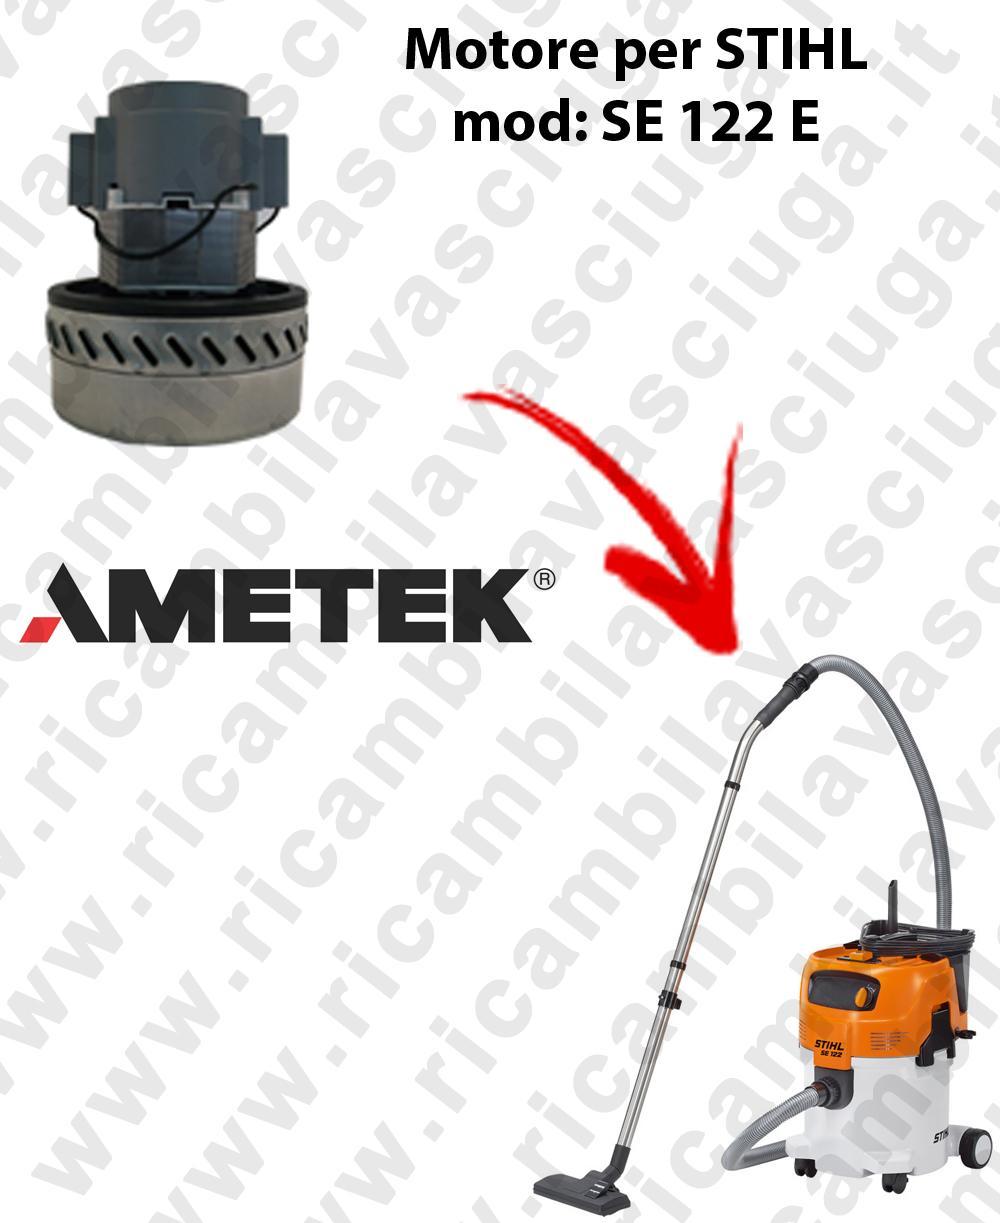 Motore aspirazione AMETEK per aspirapolvere SE 122 E - STIHL